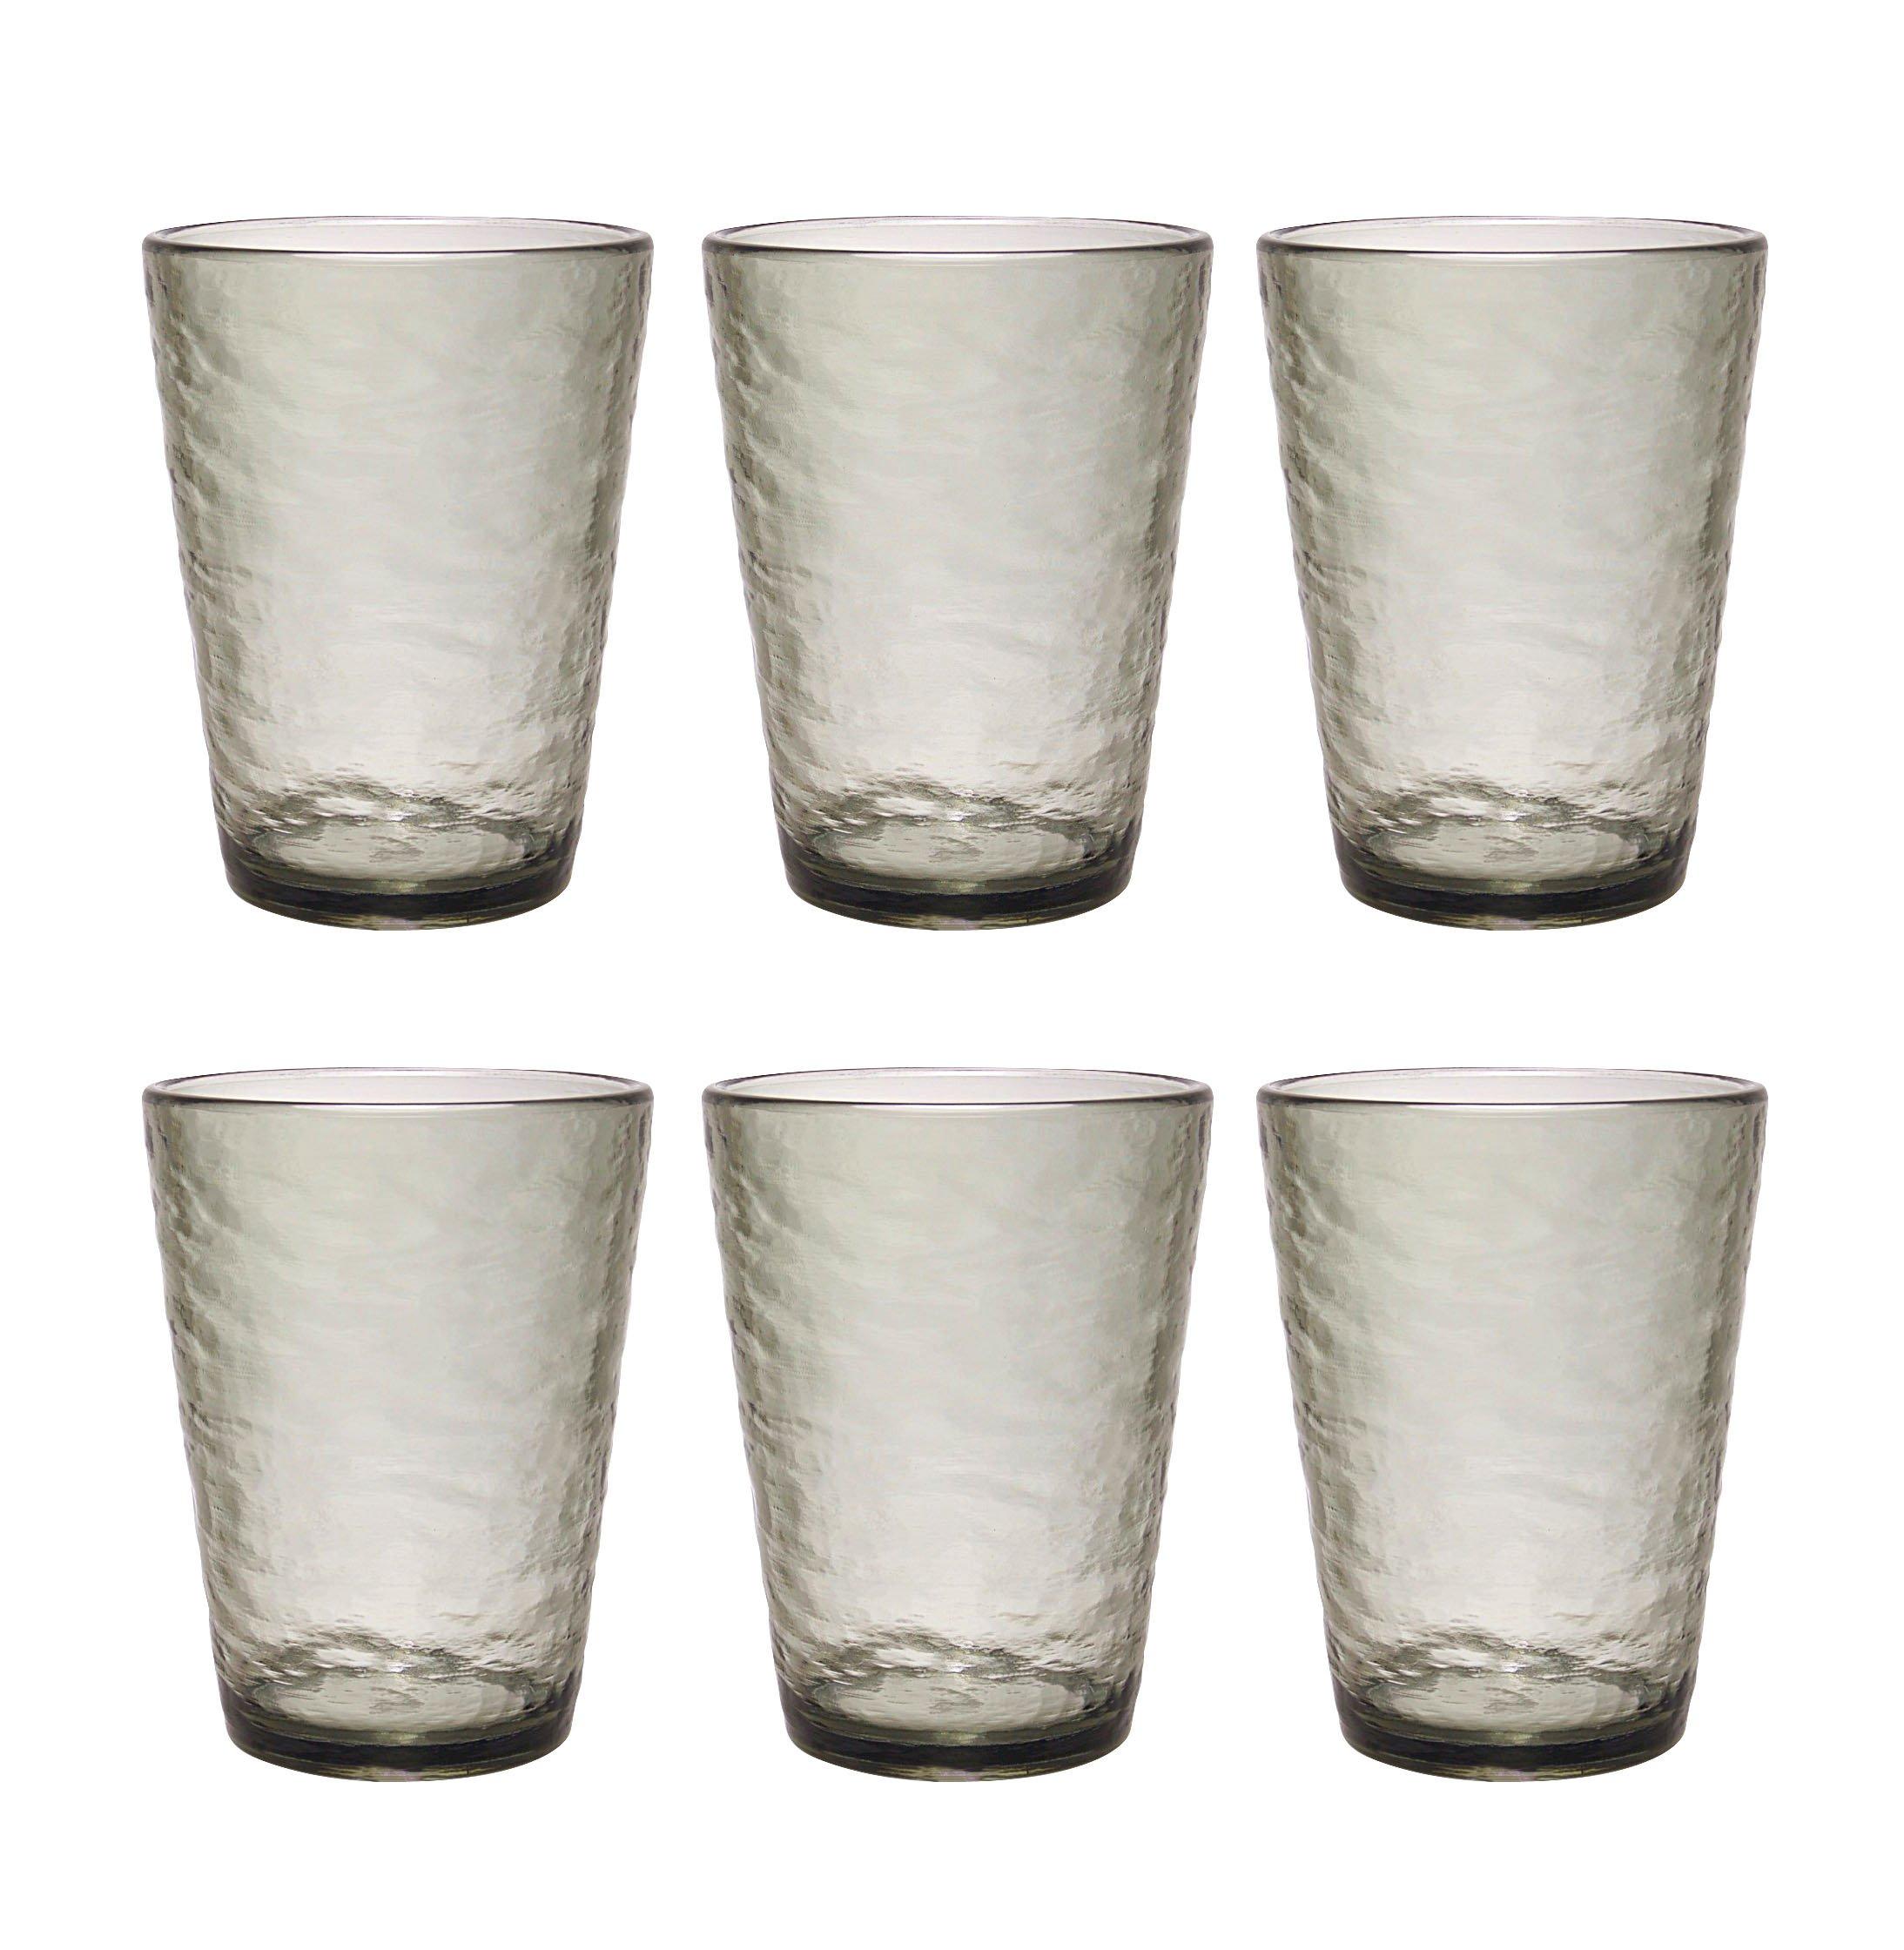 Premium Acrylic Drinking Glass, Set of 6, 16.6 oz, BPA-Free, Gray-Black